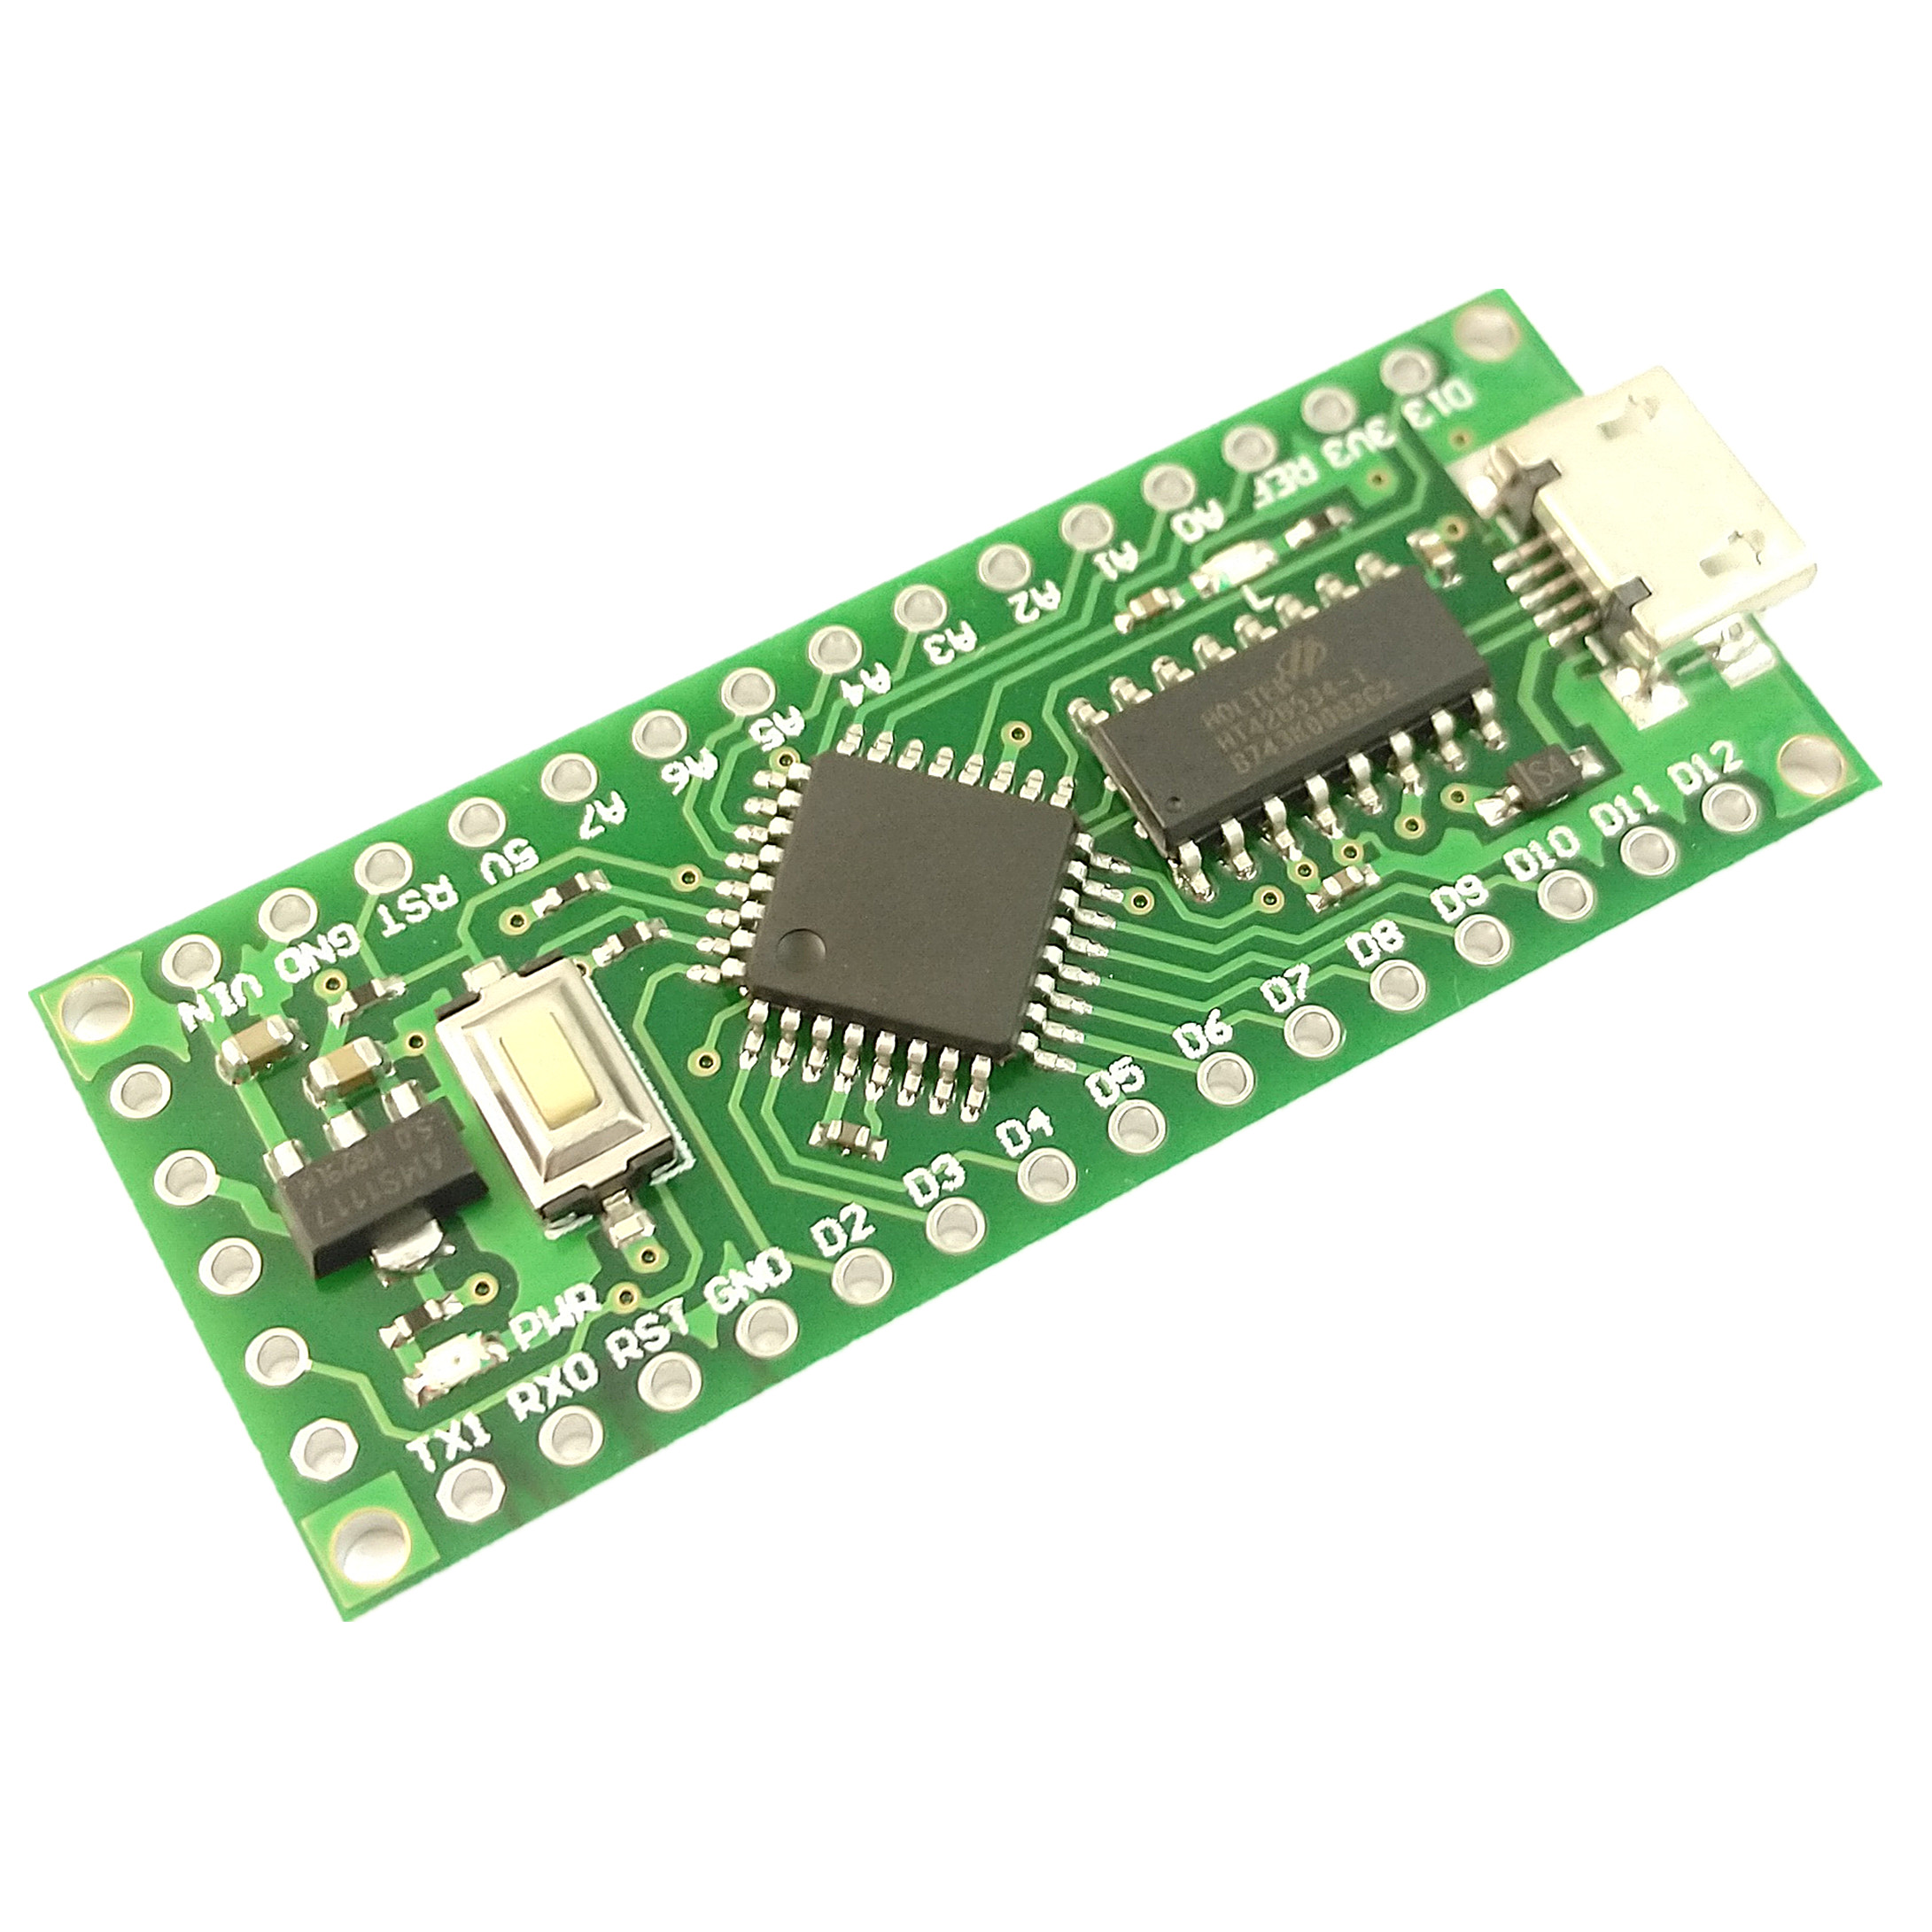 1pcs LGT8F328P-LQFP32 MiniEVB Alternative Arduino Nano V3.0 ATMeag328P HT42B534-1 SOP16 USB Driver